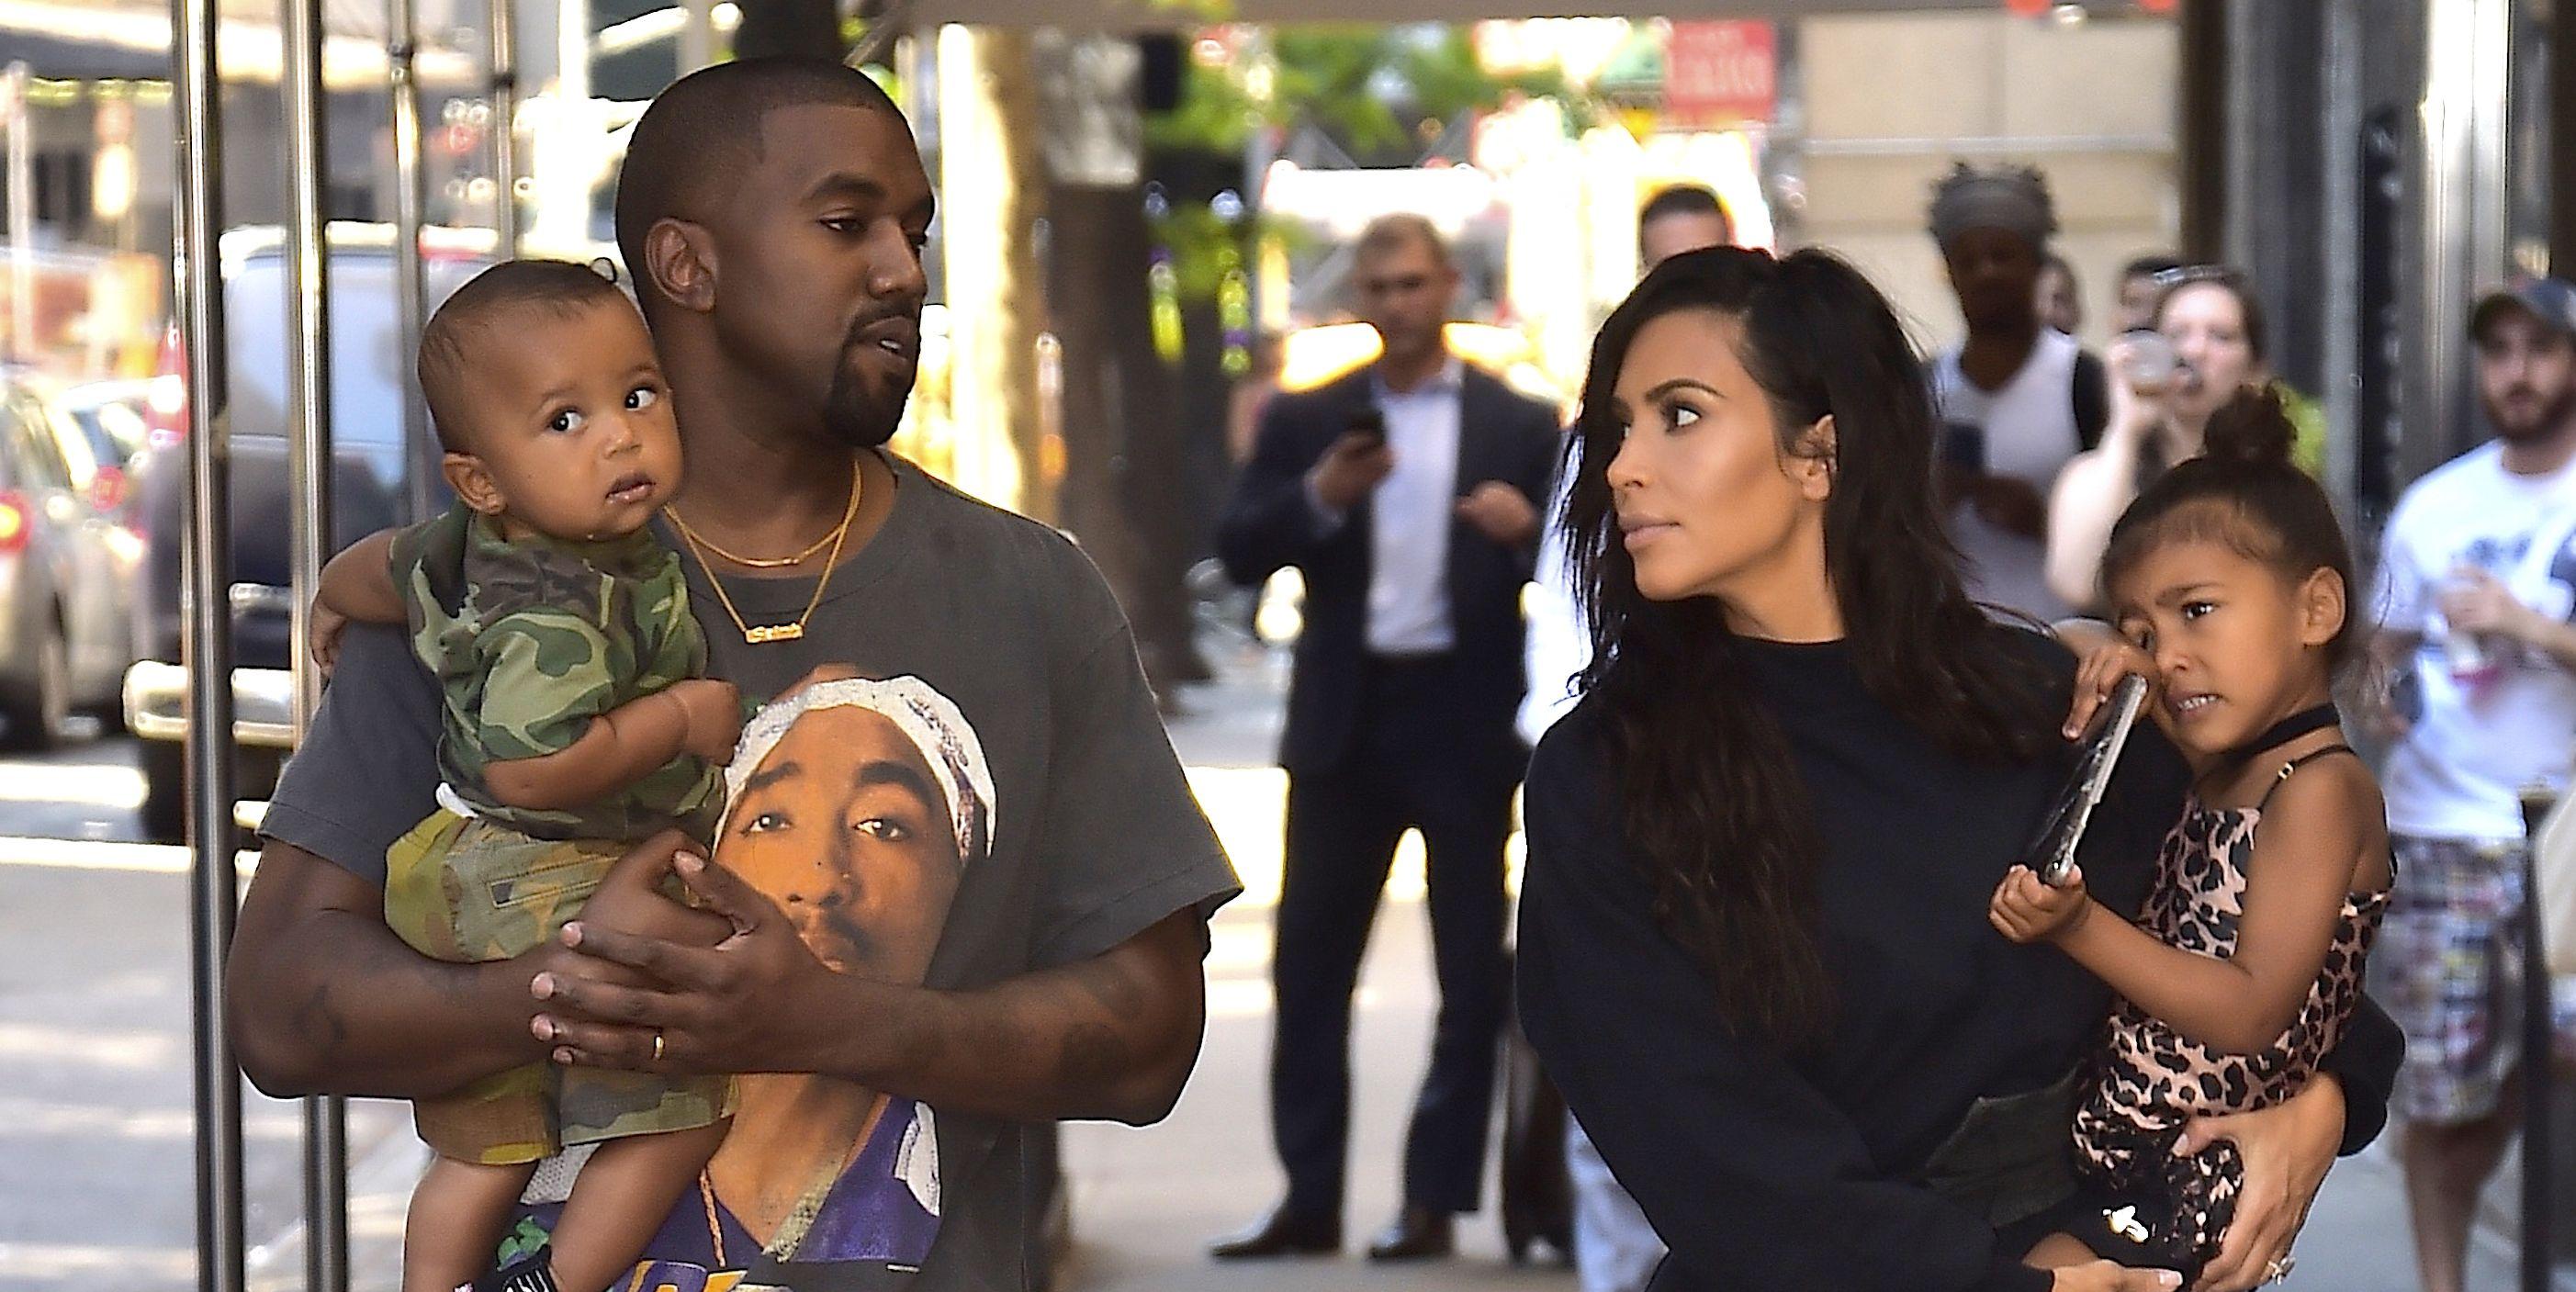 Kim Kardashian Shared Family Photos from Saint's Birthday Party